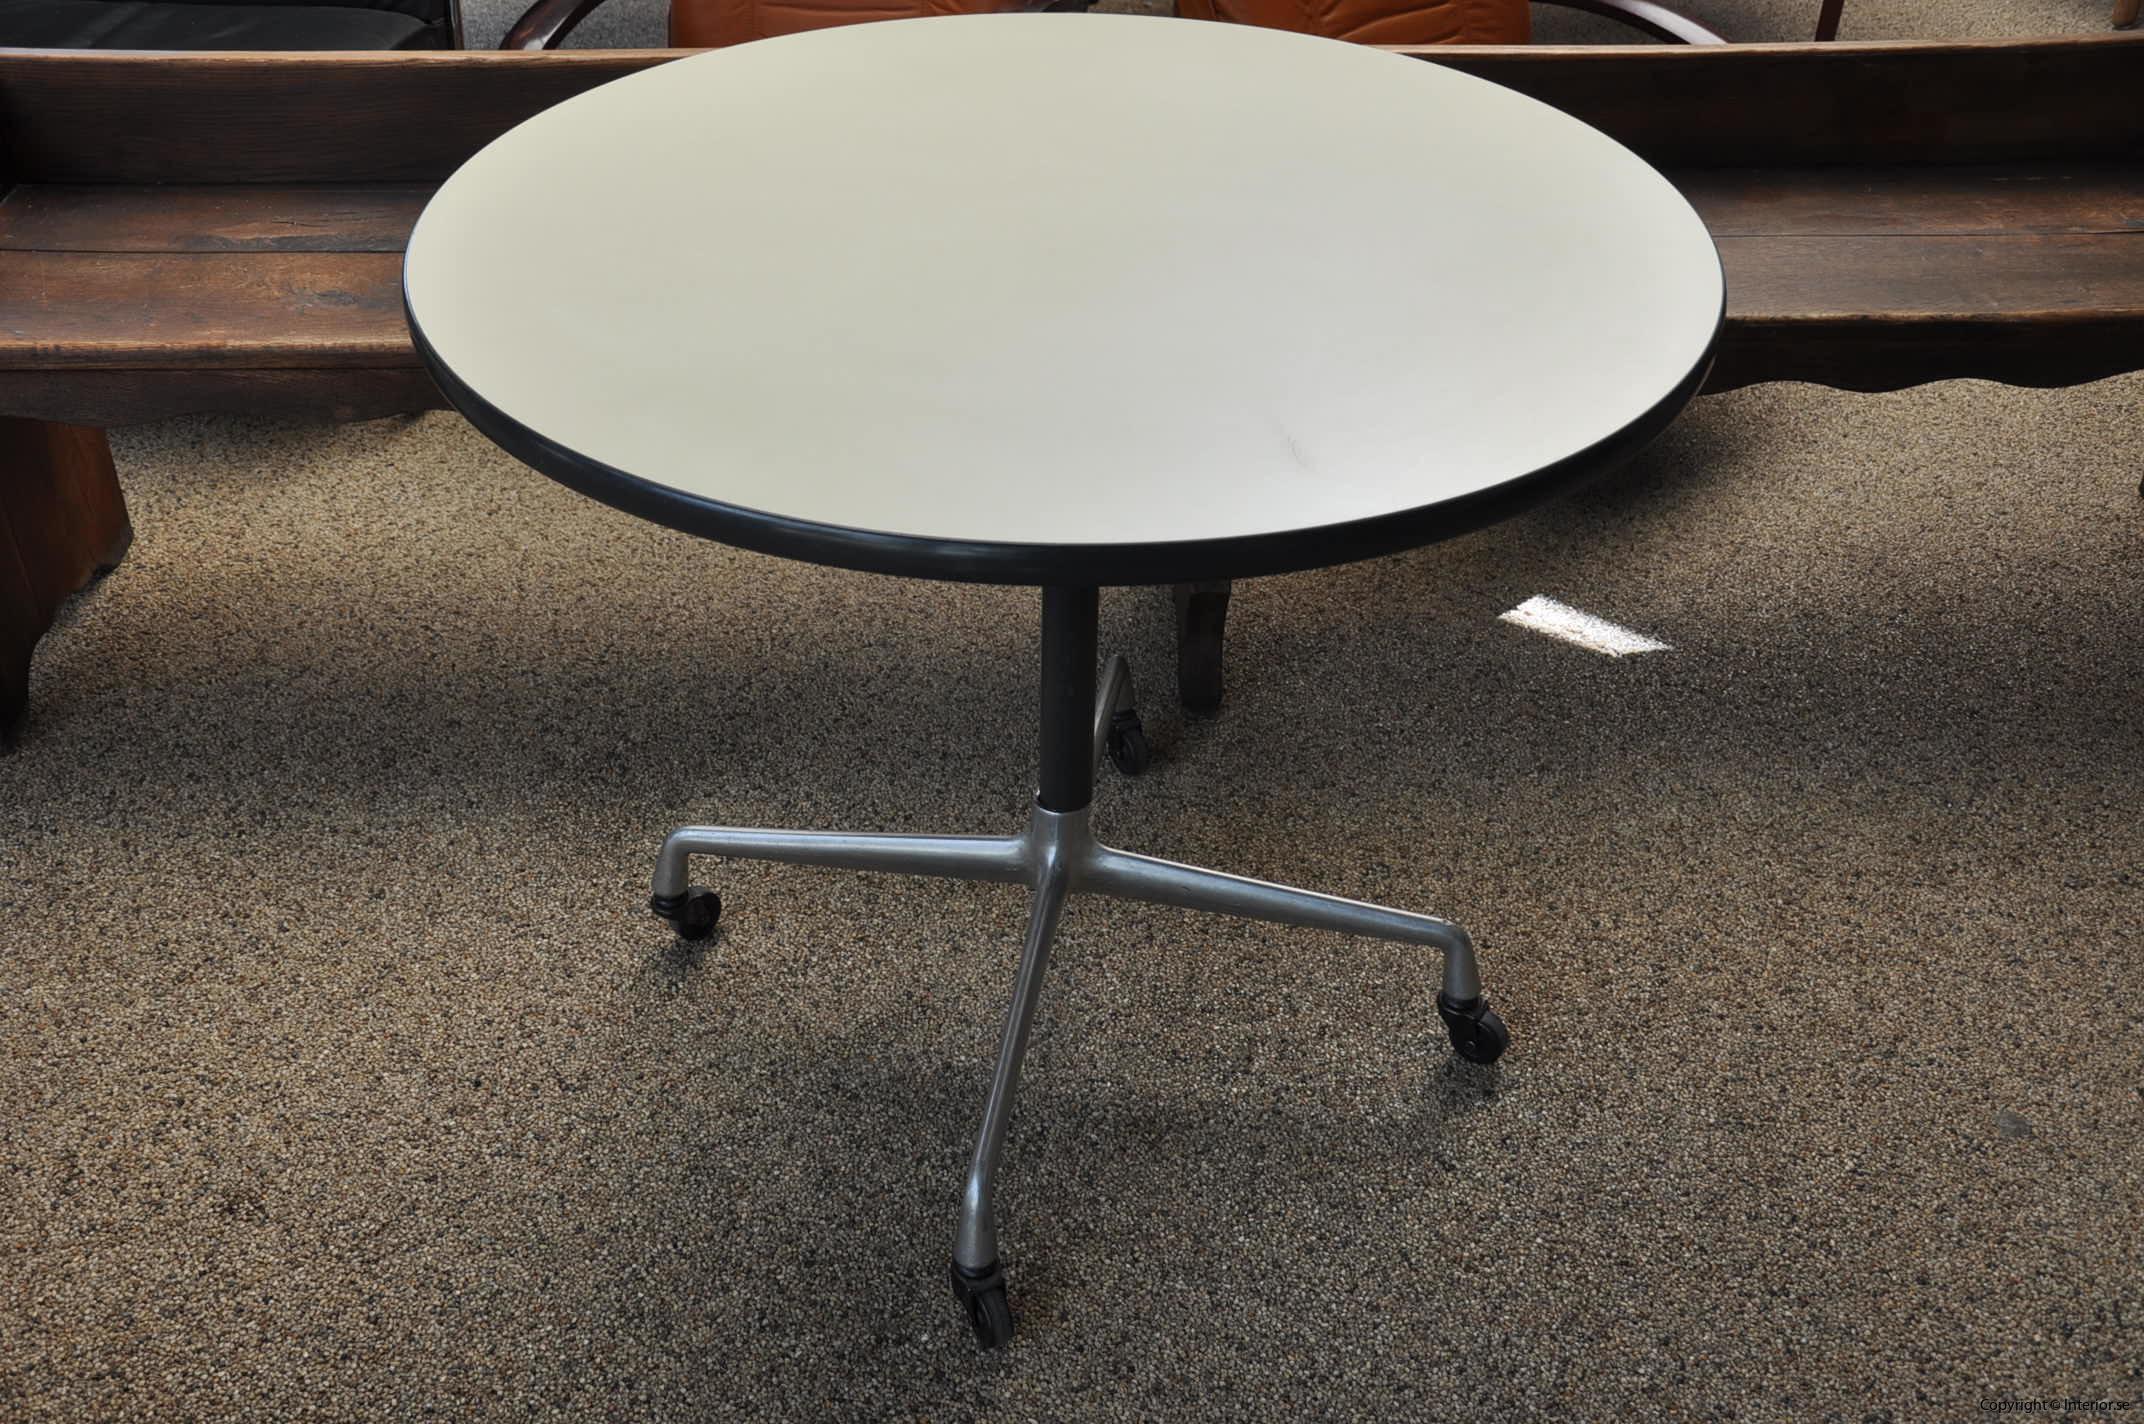 Herman Miller Rullbord Designmöbler begagnade kontorsmöbler